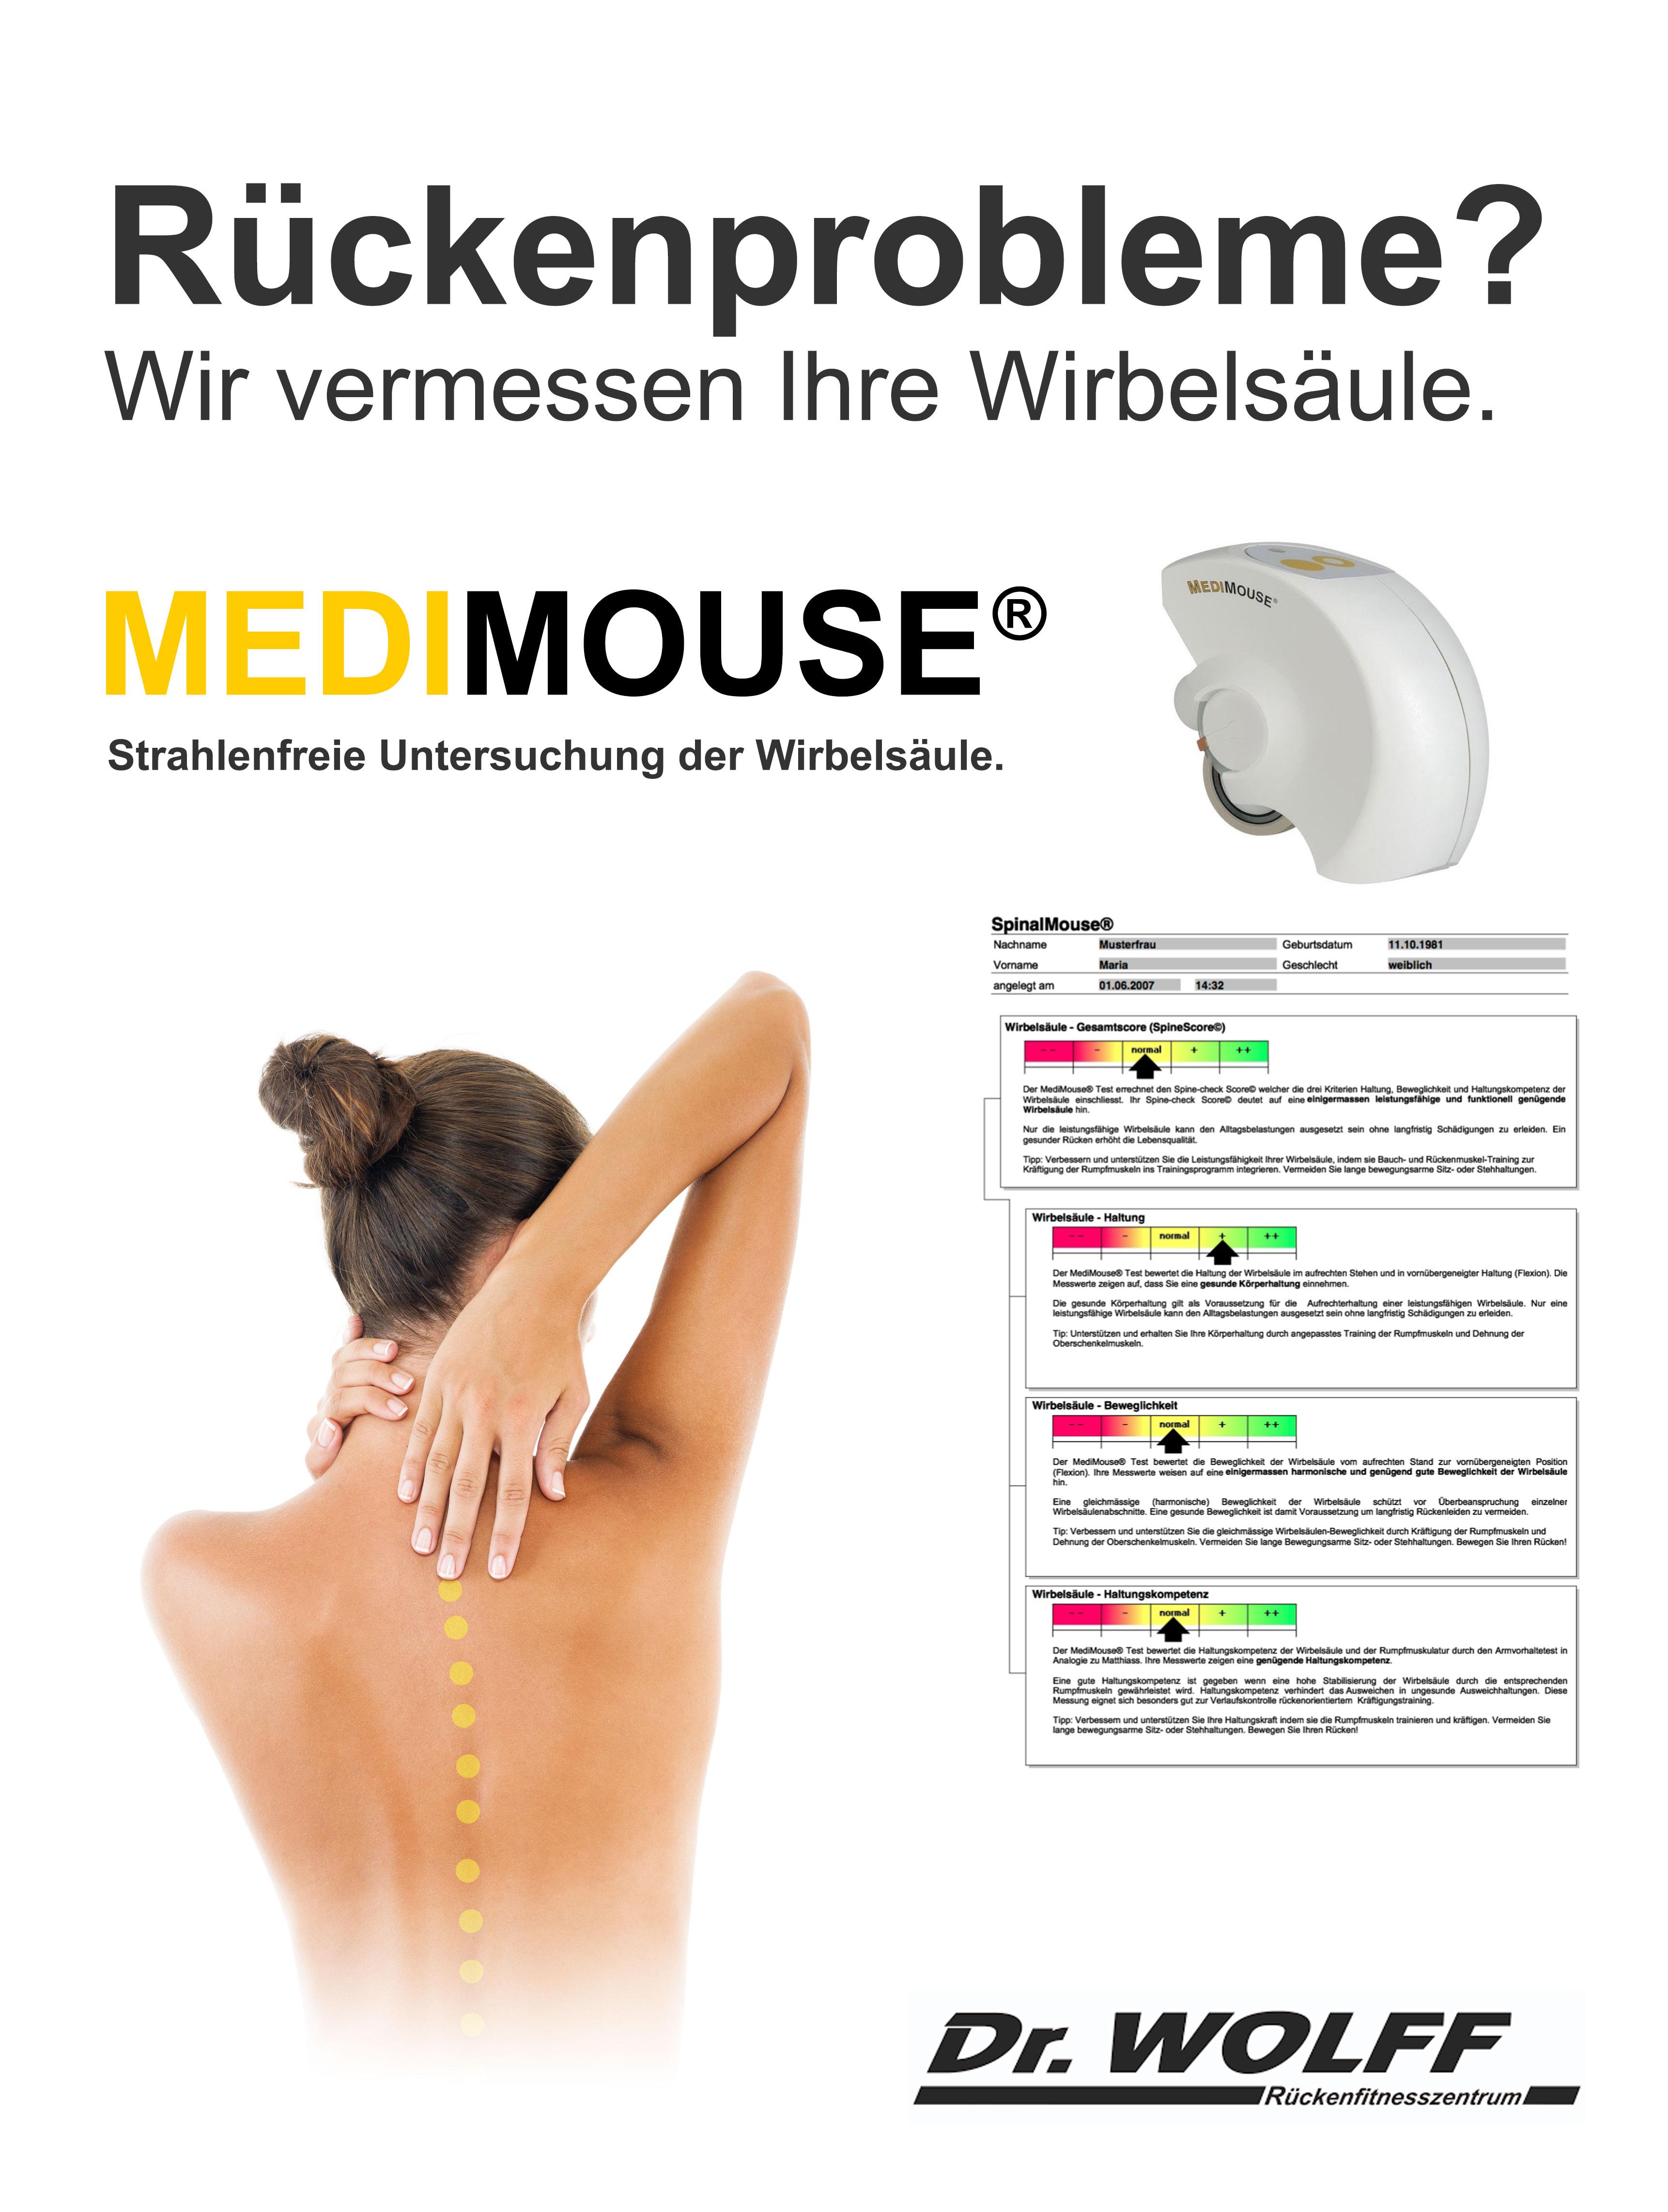 MediMouse